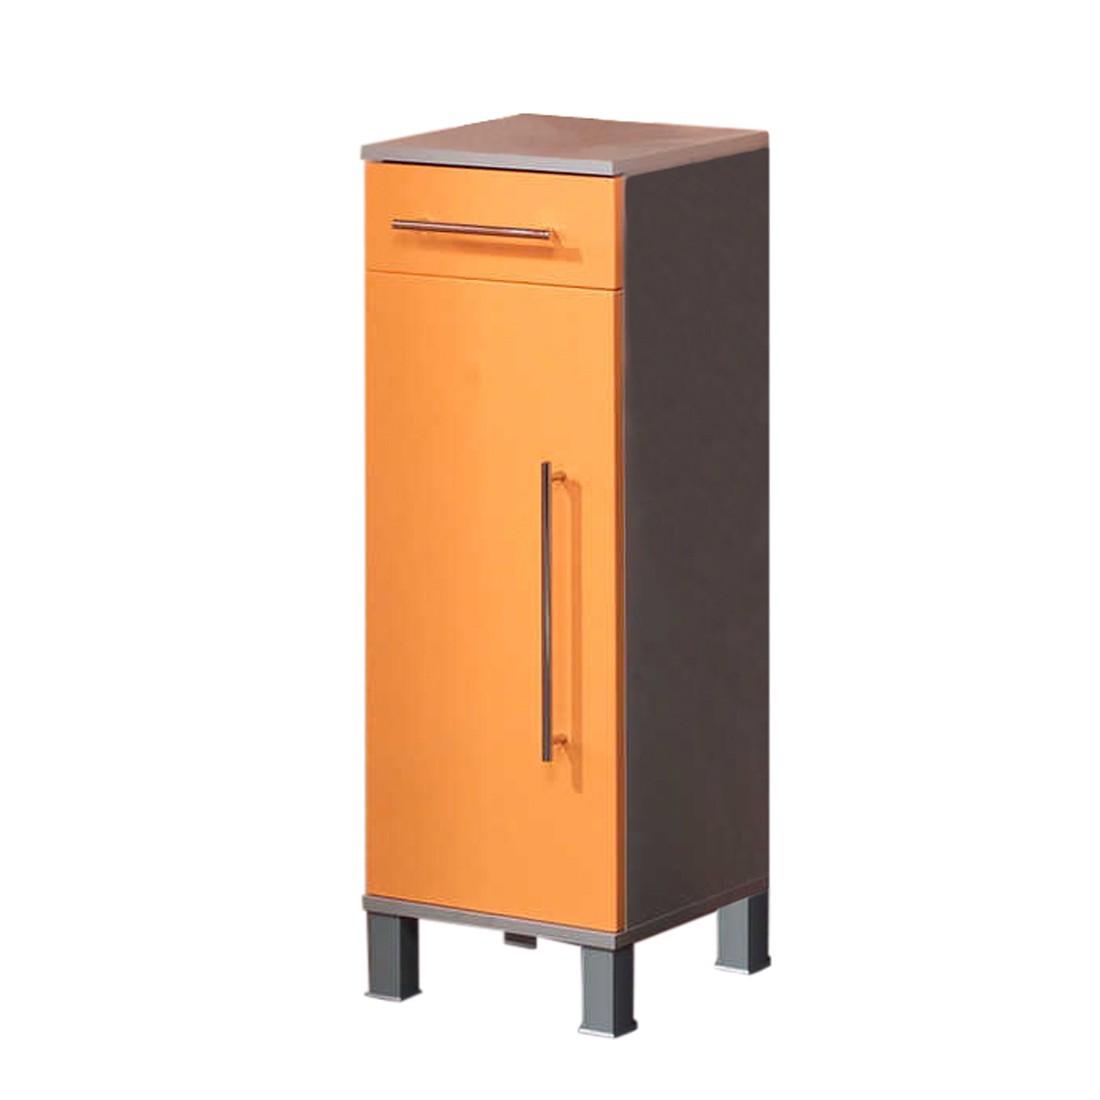 unterschrank ponza 1 t r orange. Black Bedroom Furniture Sets. Home Design Ideas